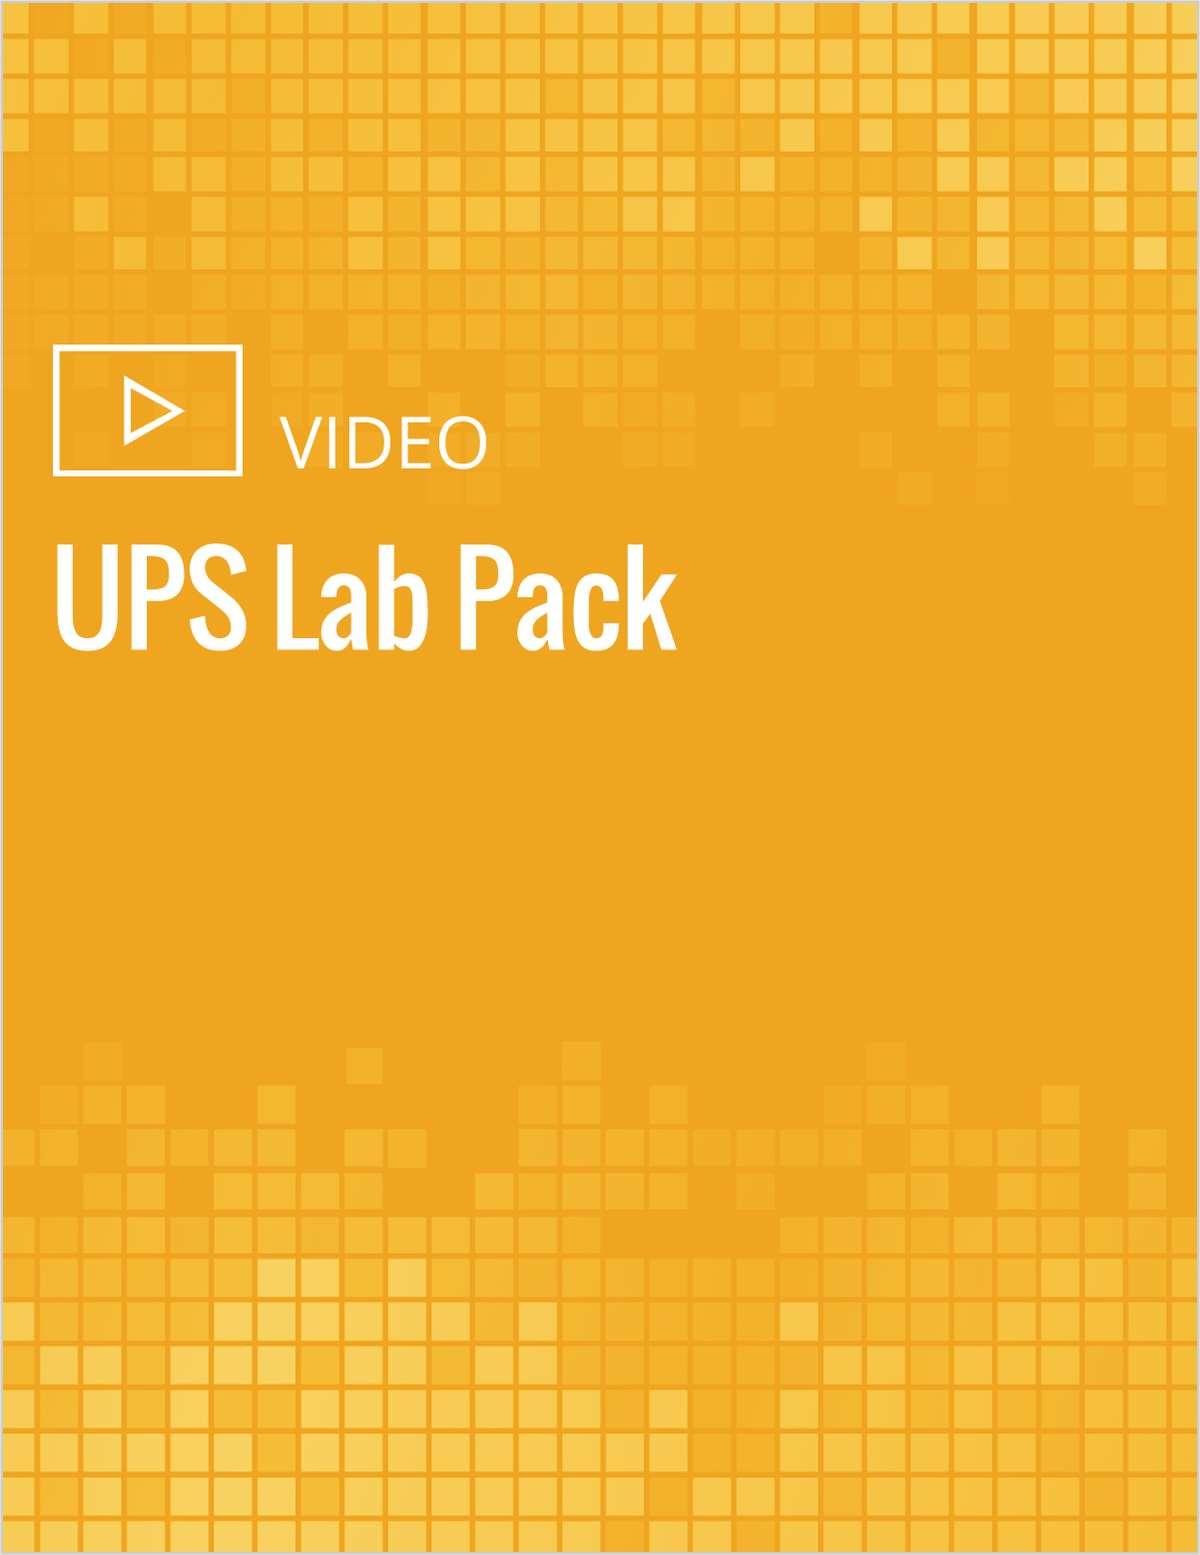 UPS Lab Pak